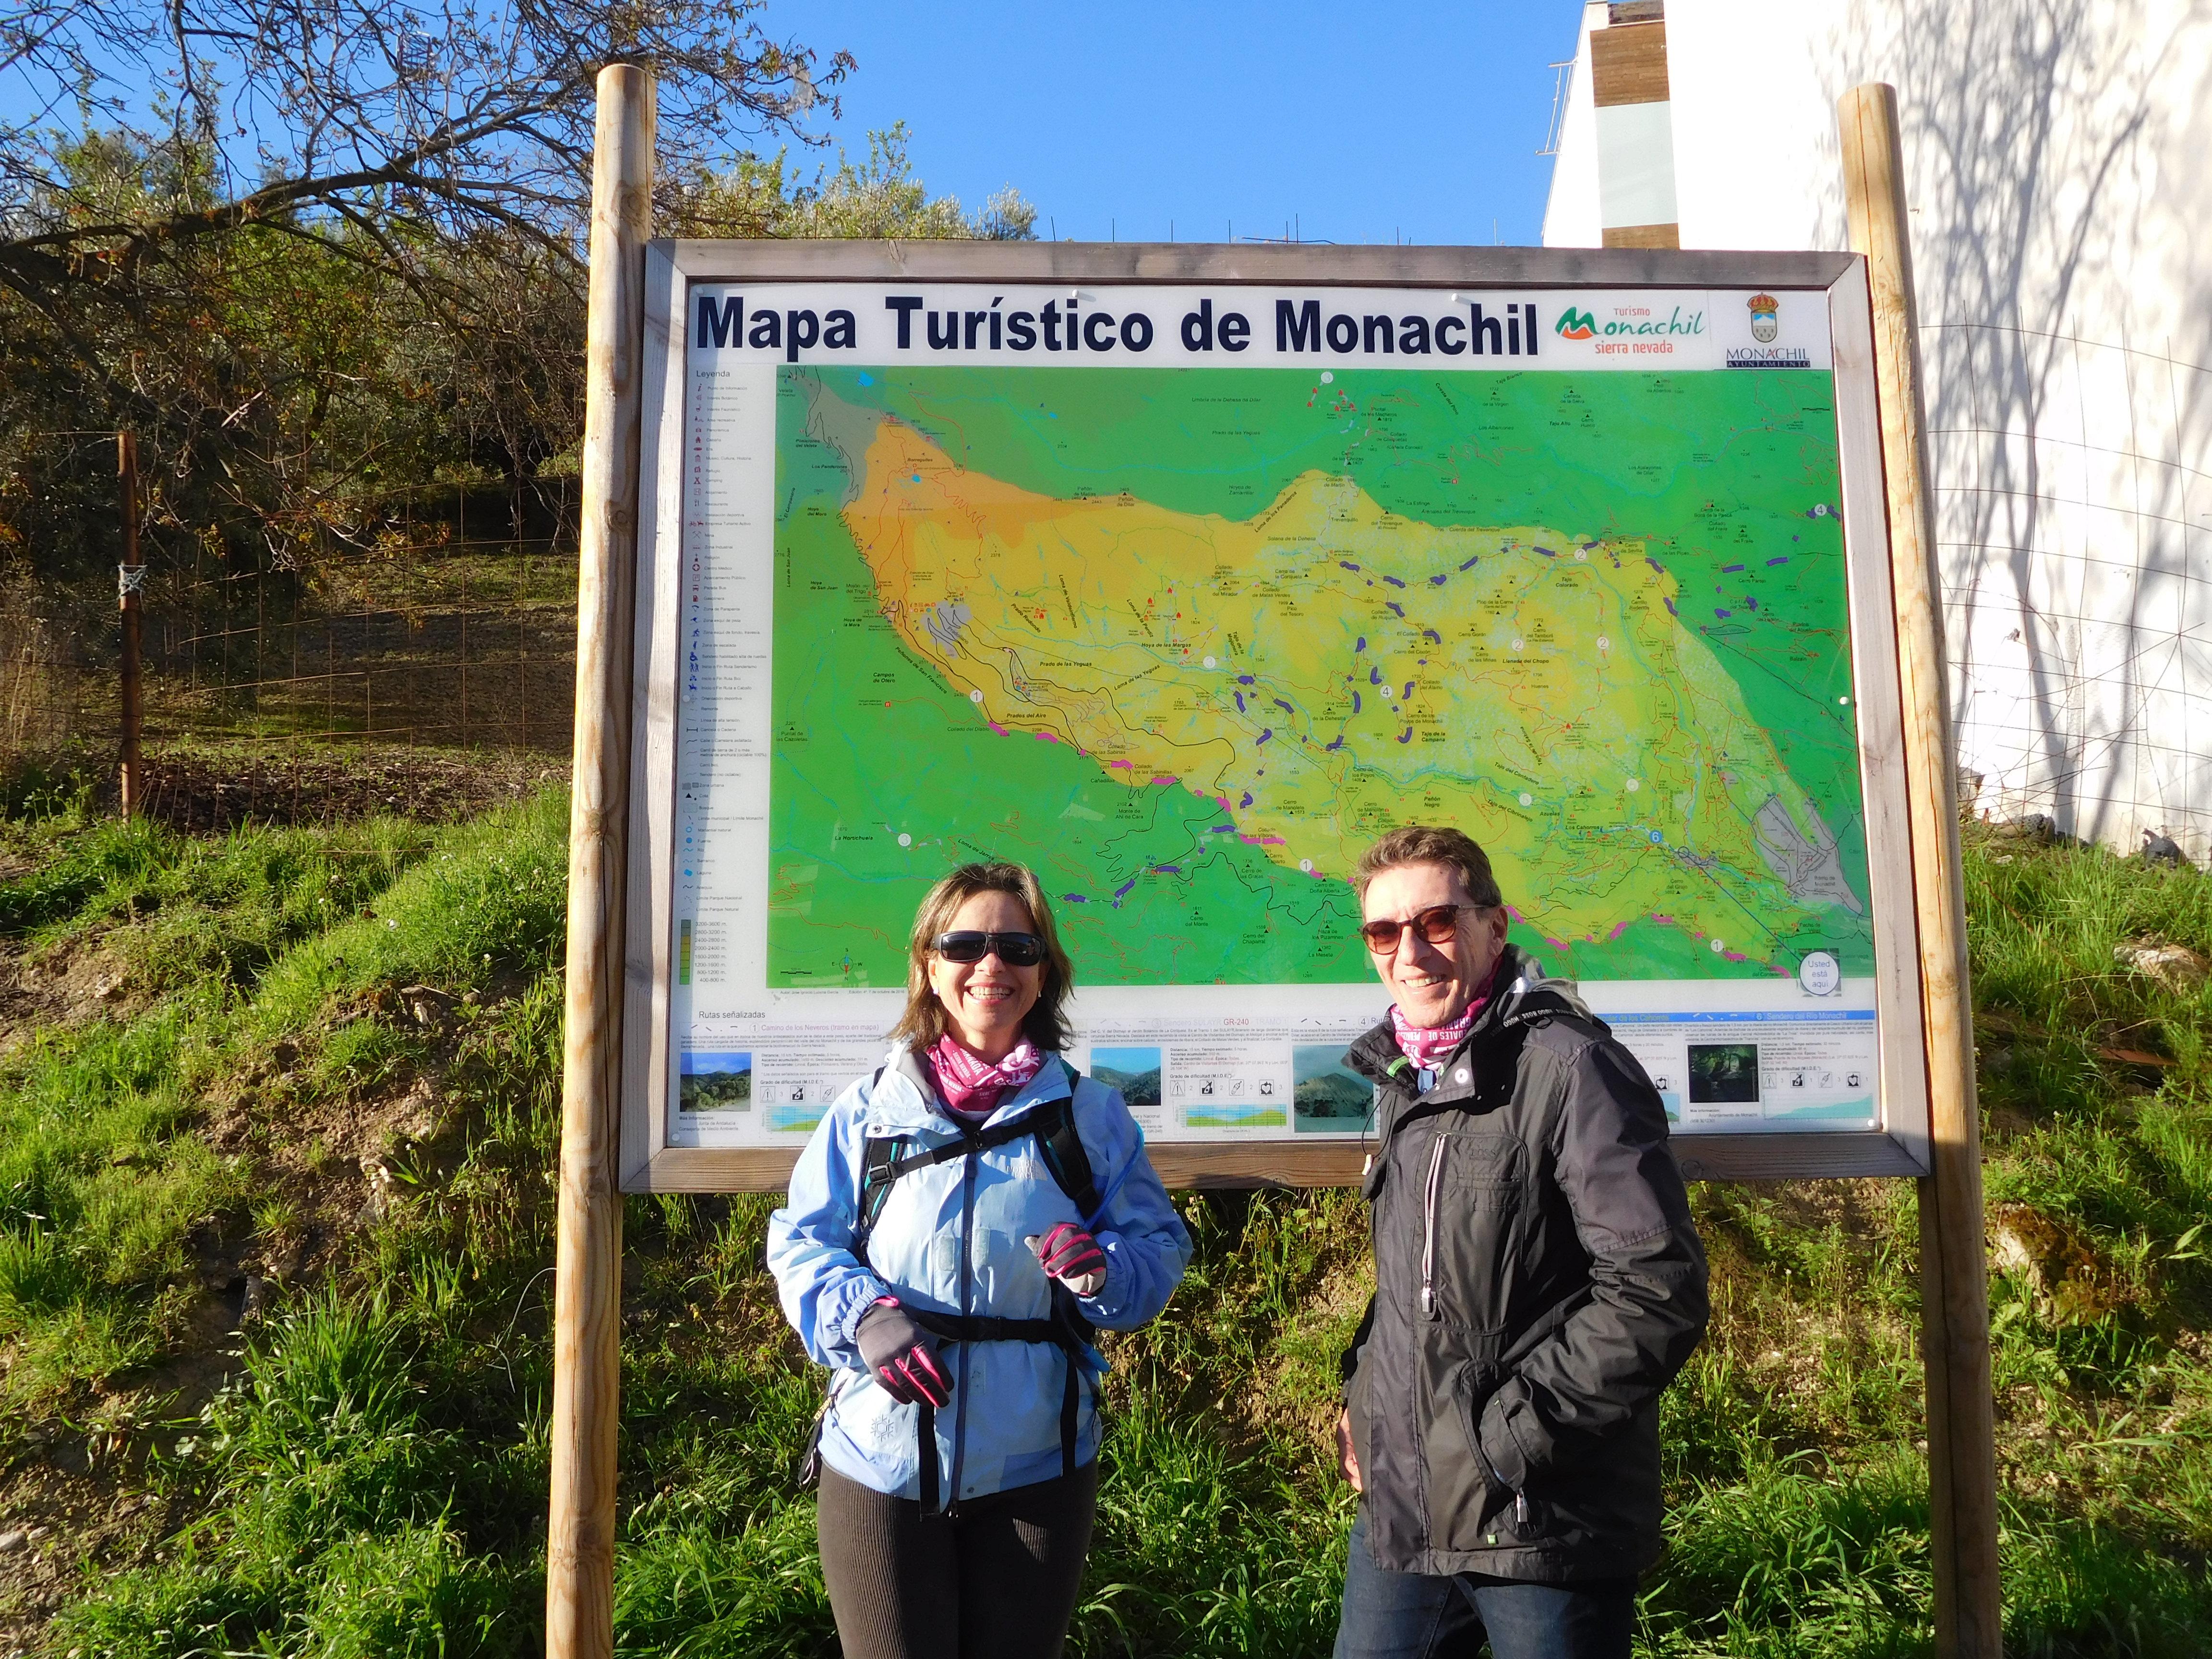 142 Cahorros de Monachil.jpg